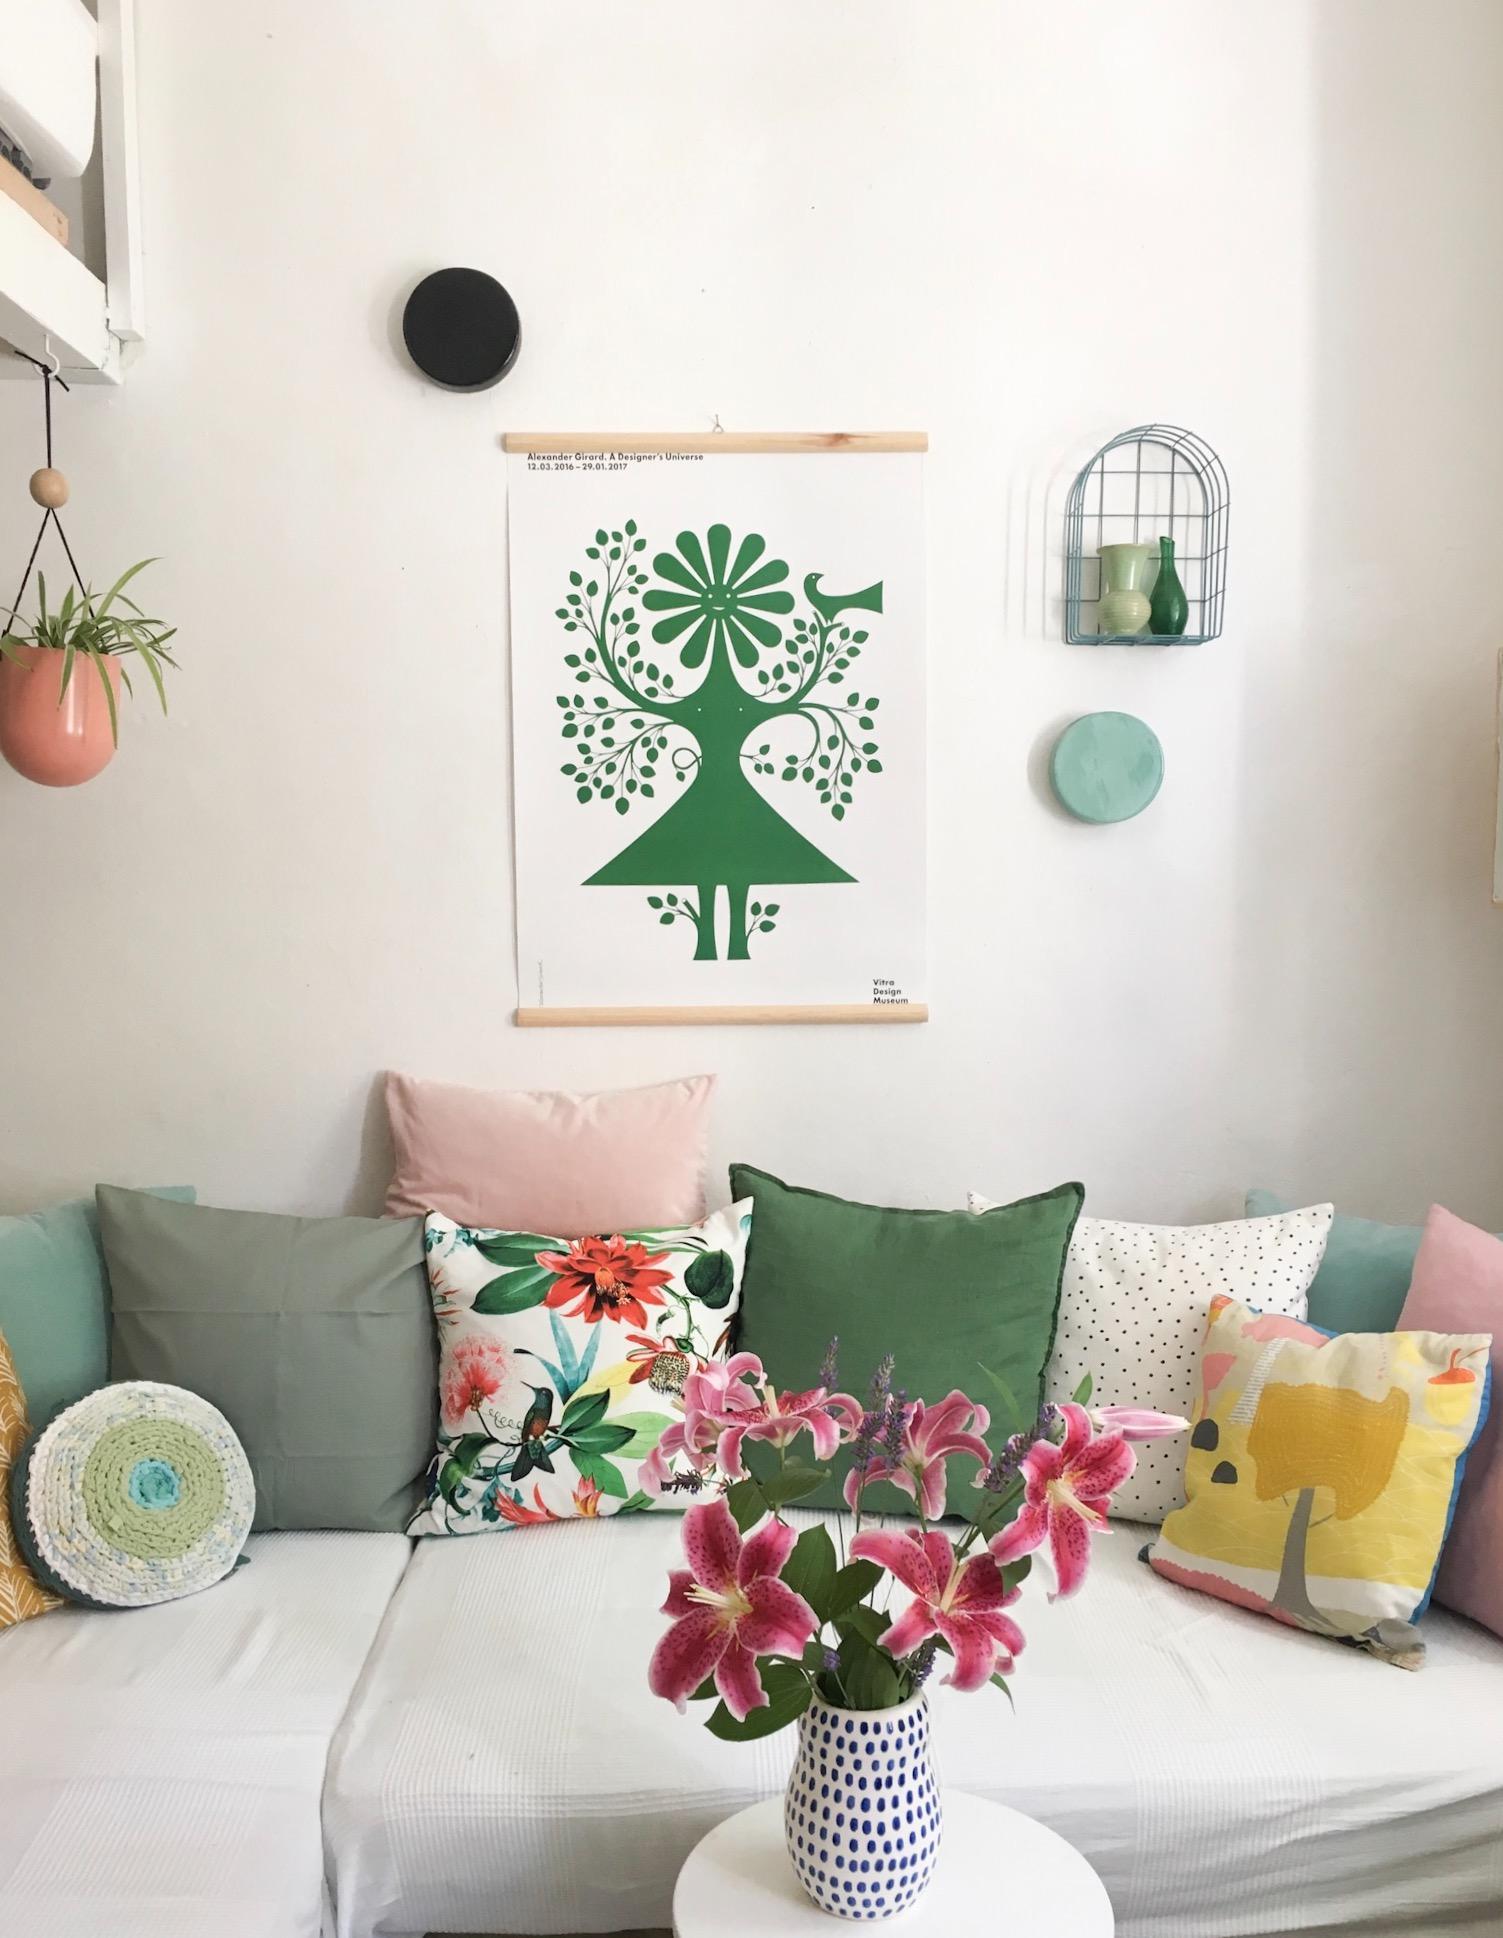 sofa bilder ideen couchstyle. Black Bedroom Furniture Sets. Home Design Ideas